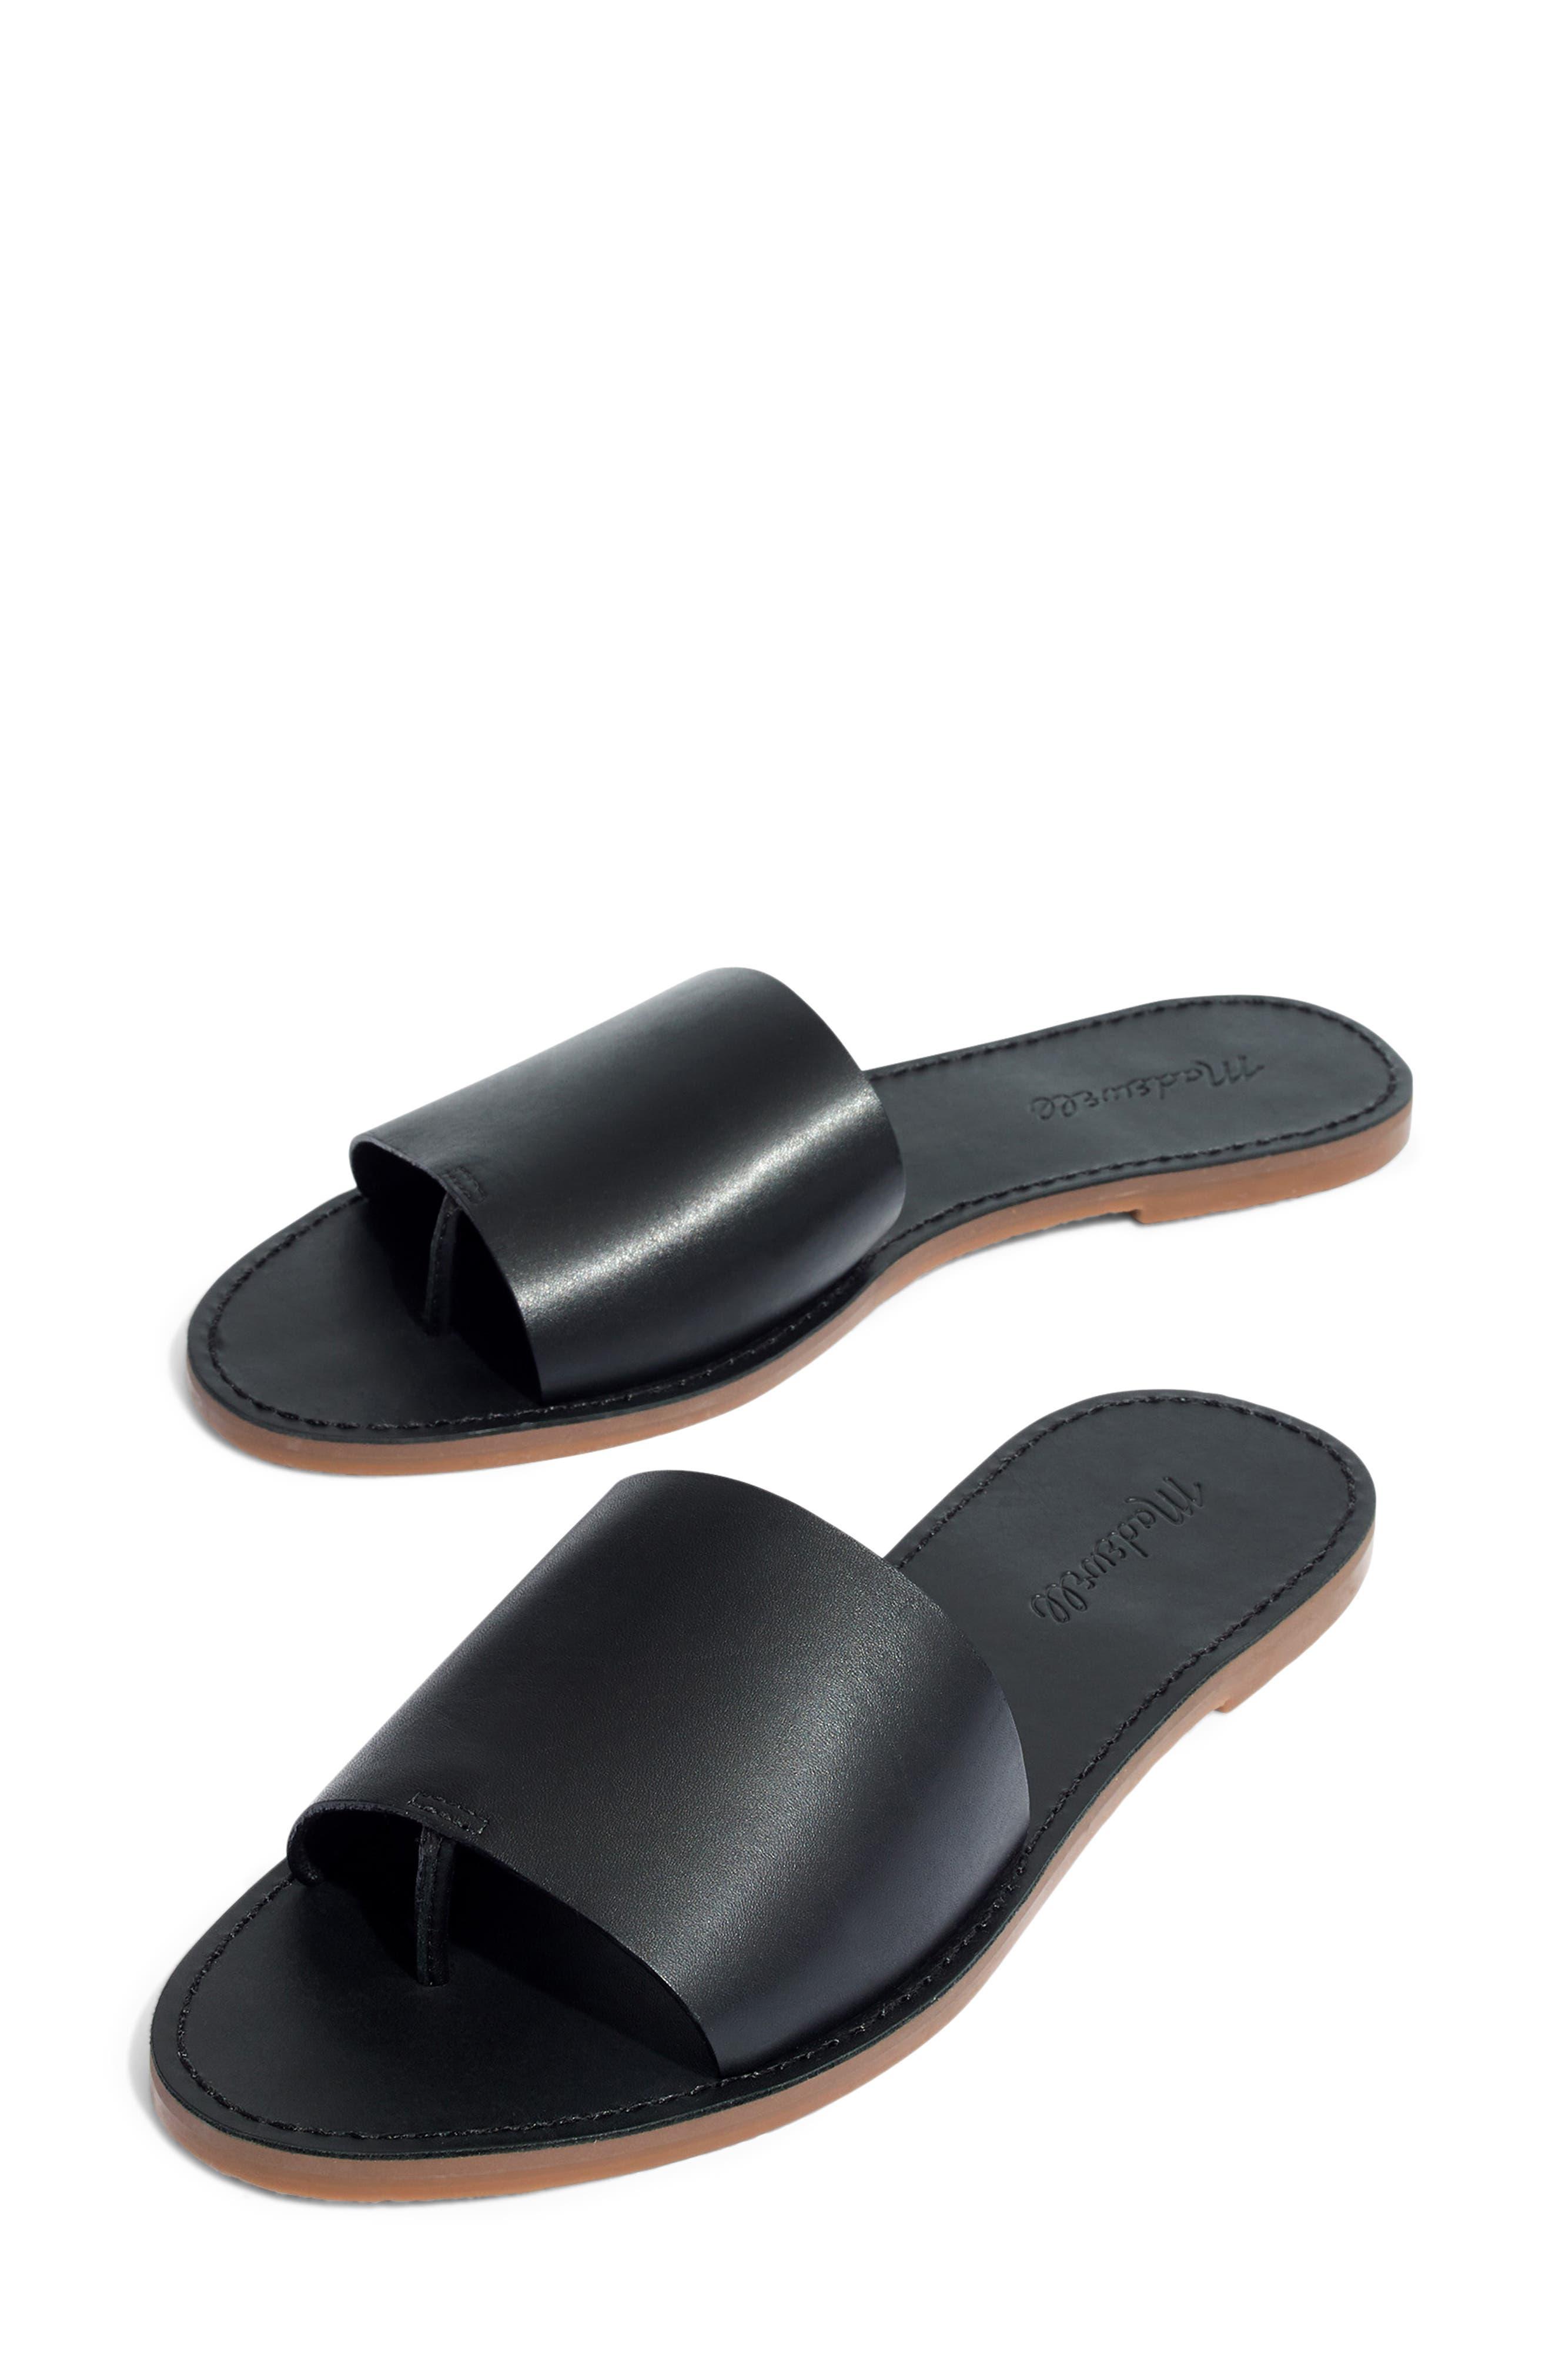 MADEWELL Boardwalk Post Slide Sandal, Main, color, TRUE BLACK LEATHER